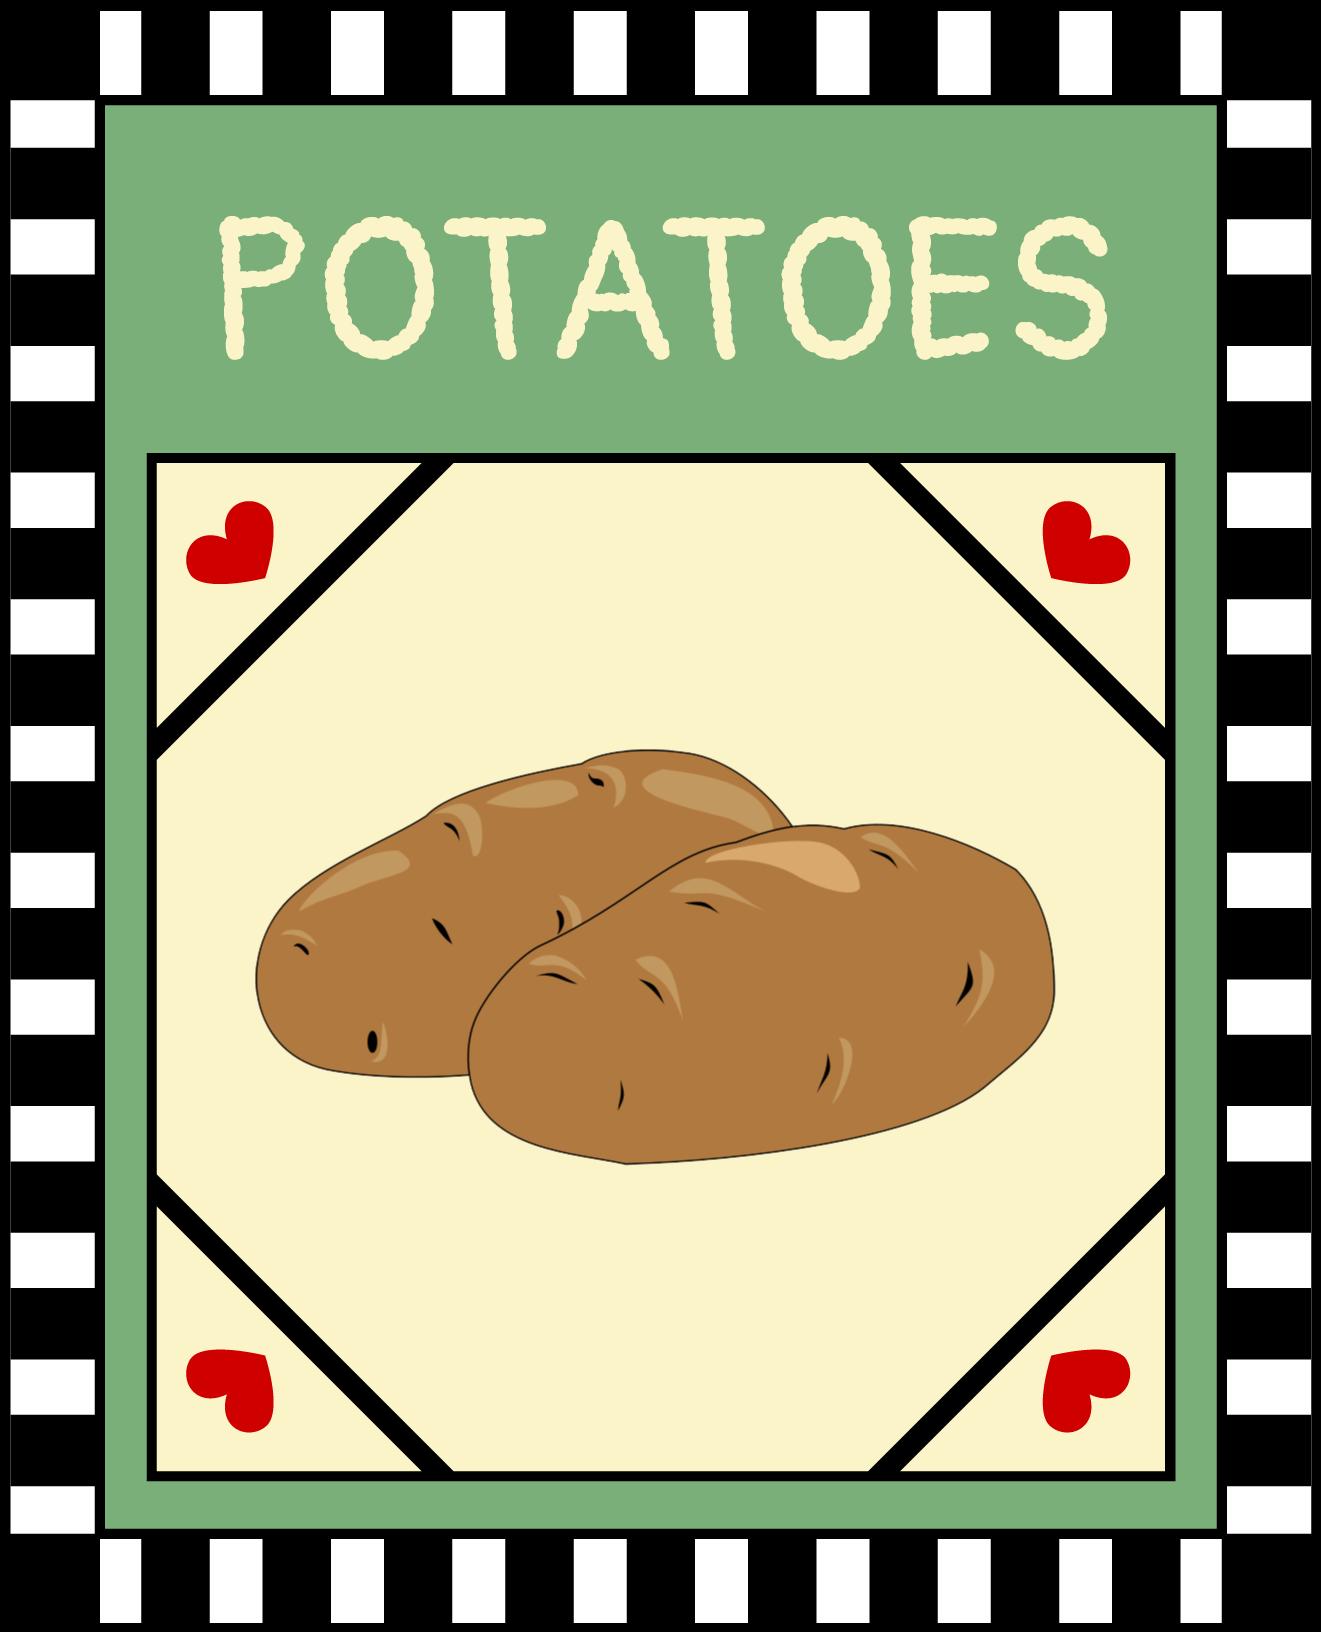 Potatoes / Sweet Potatoes